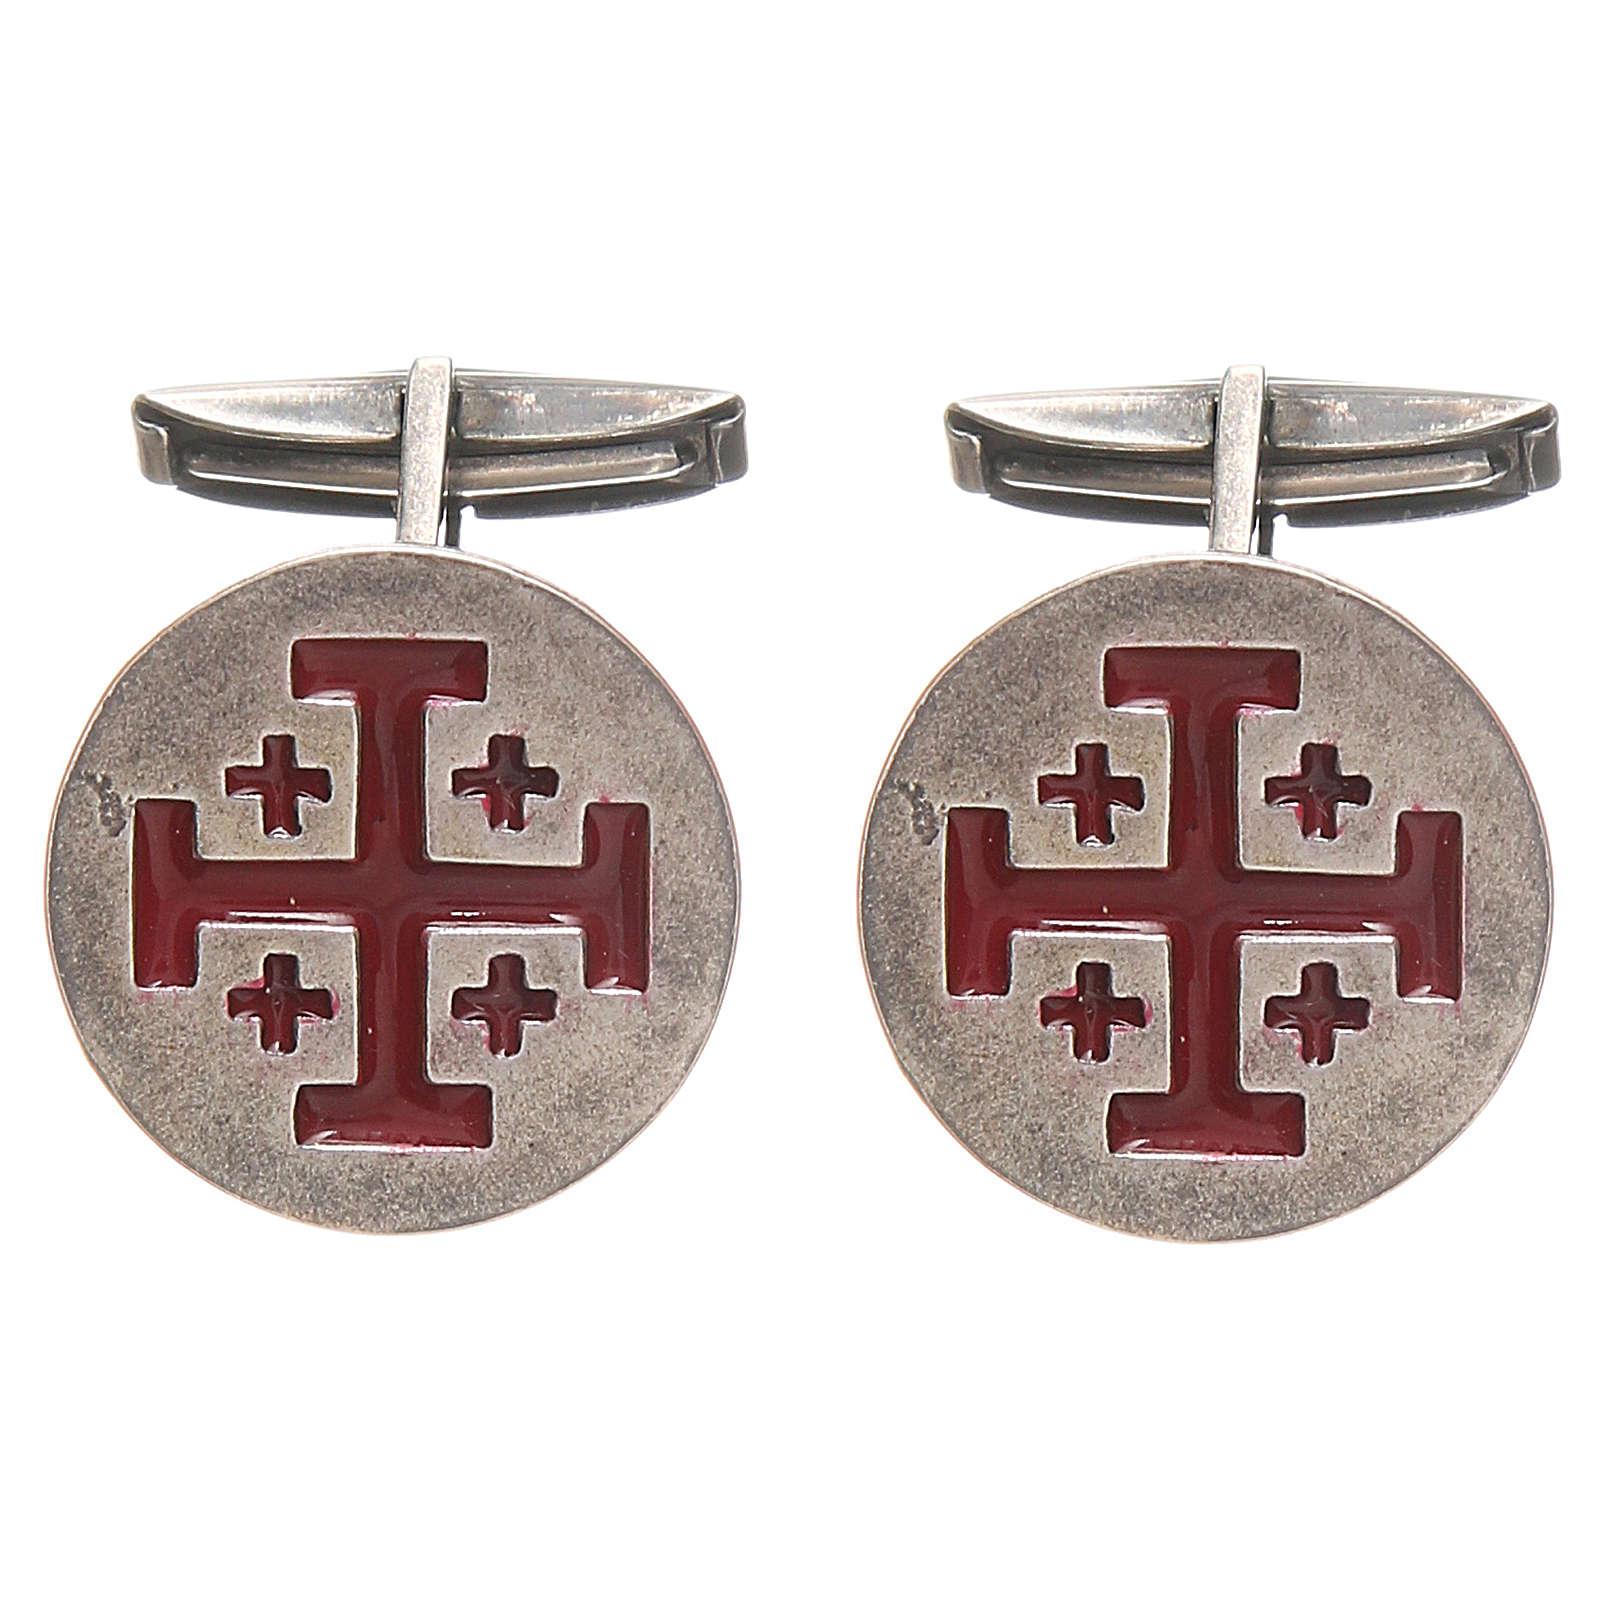 Manschettenknöpfe Silber 925 Jerusalem Kreuz 1,9cm rot 4